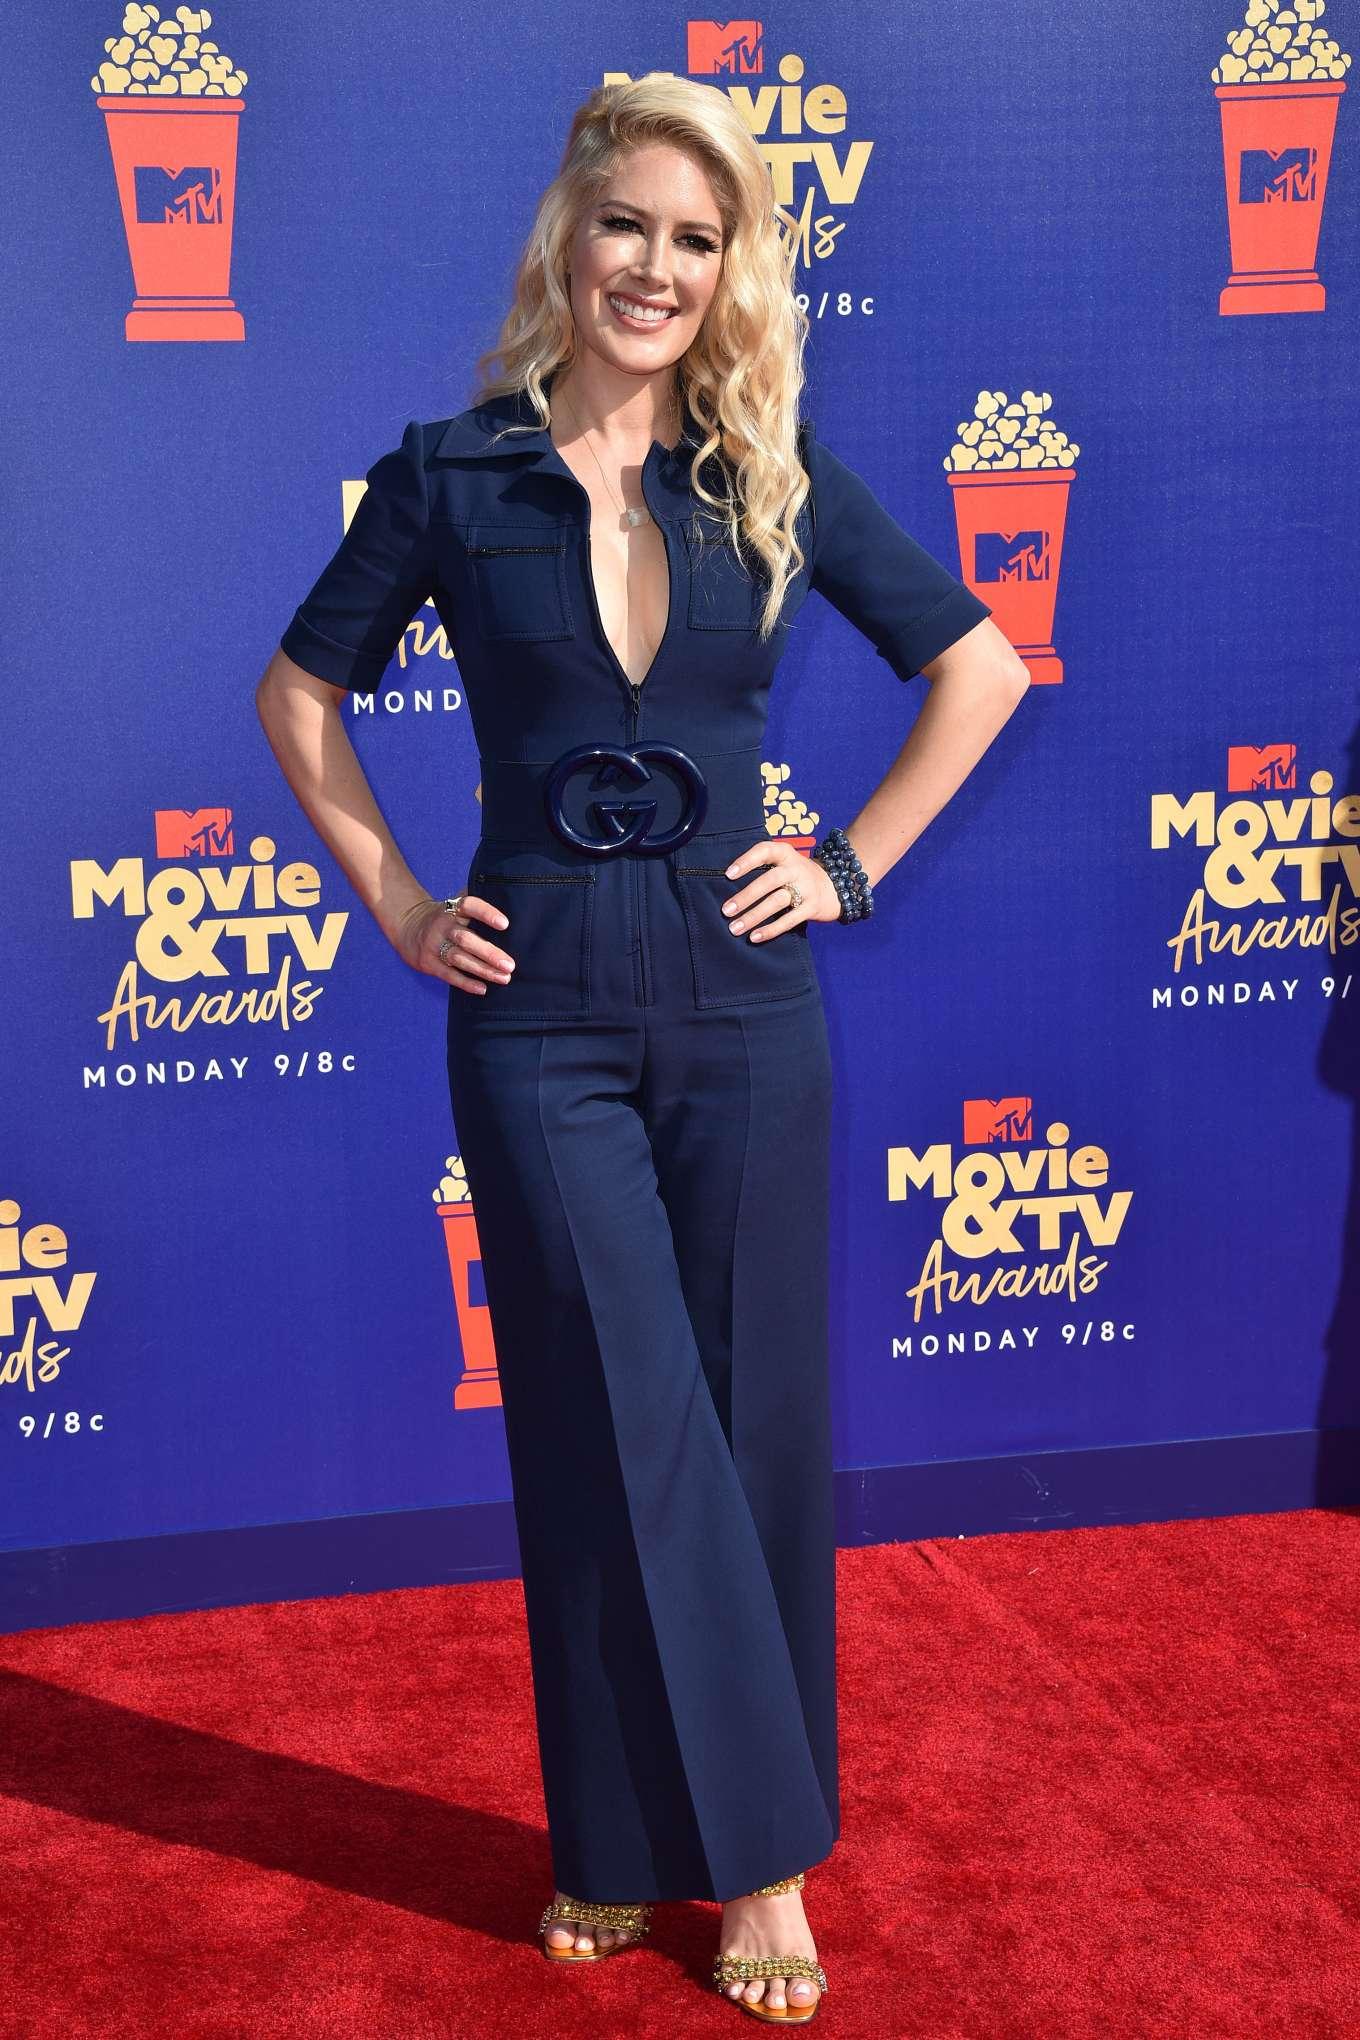 Heidi Montag 2019 : Heidi Montag: 2019 MTV Movie and TV Awards Red Carpet-05